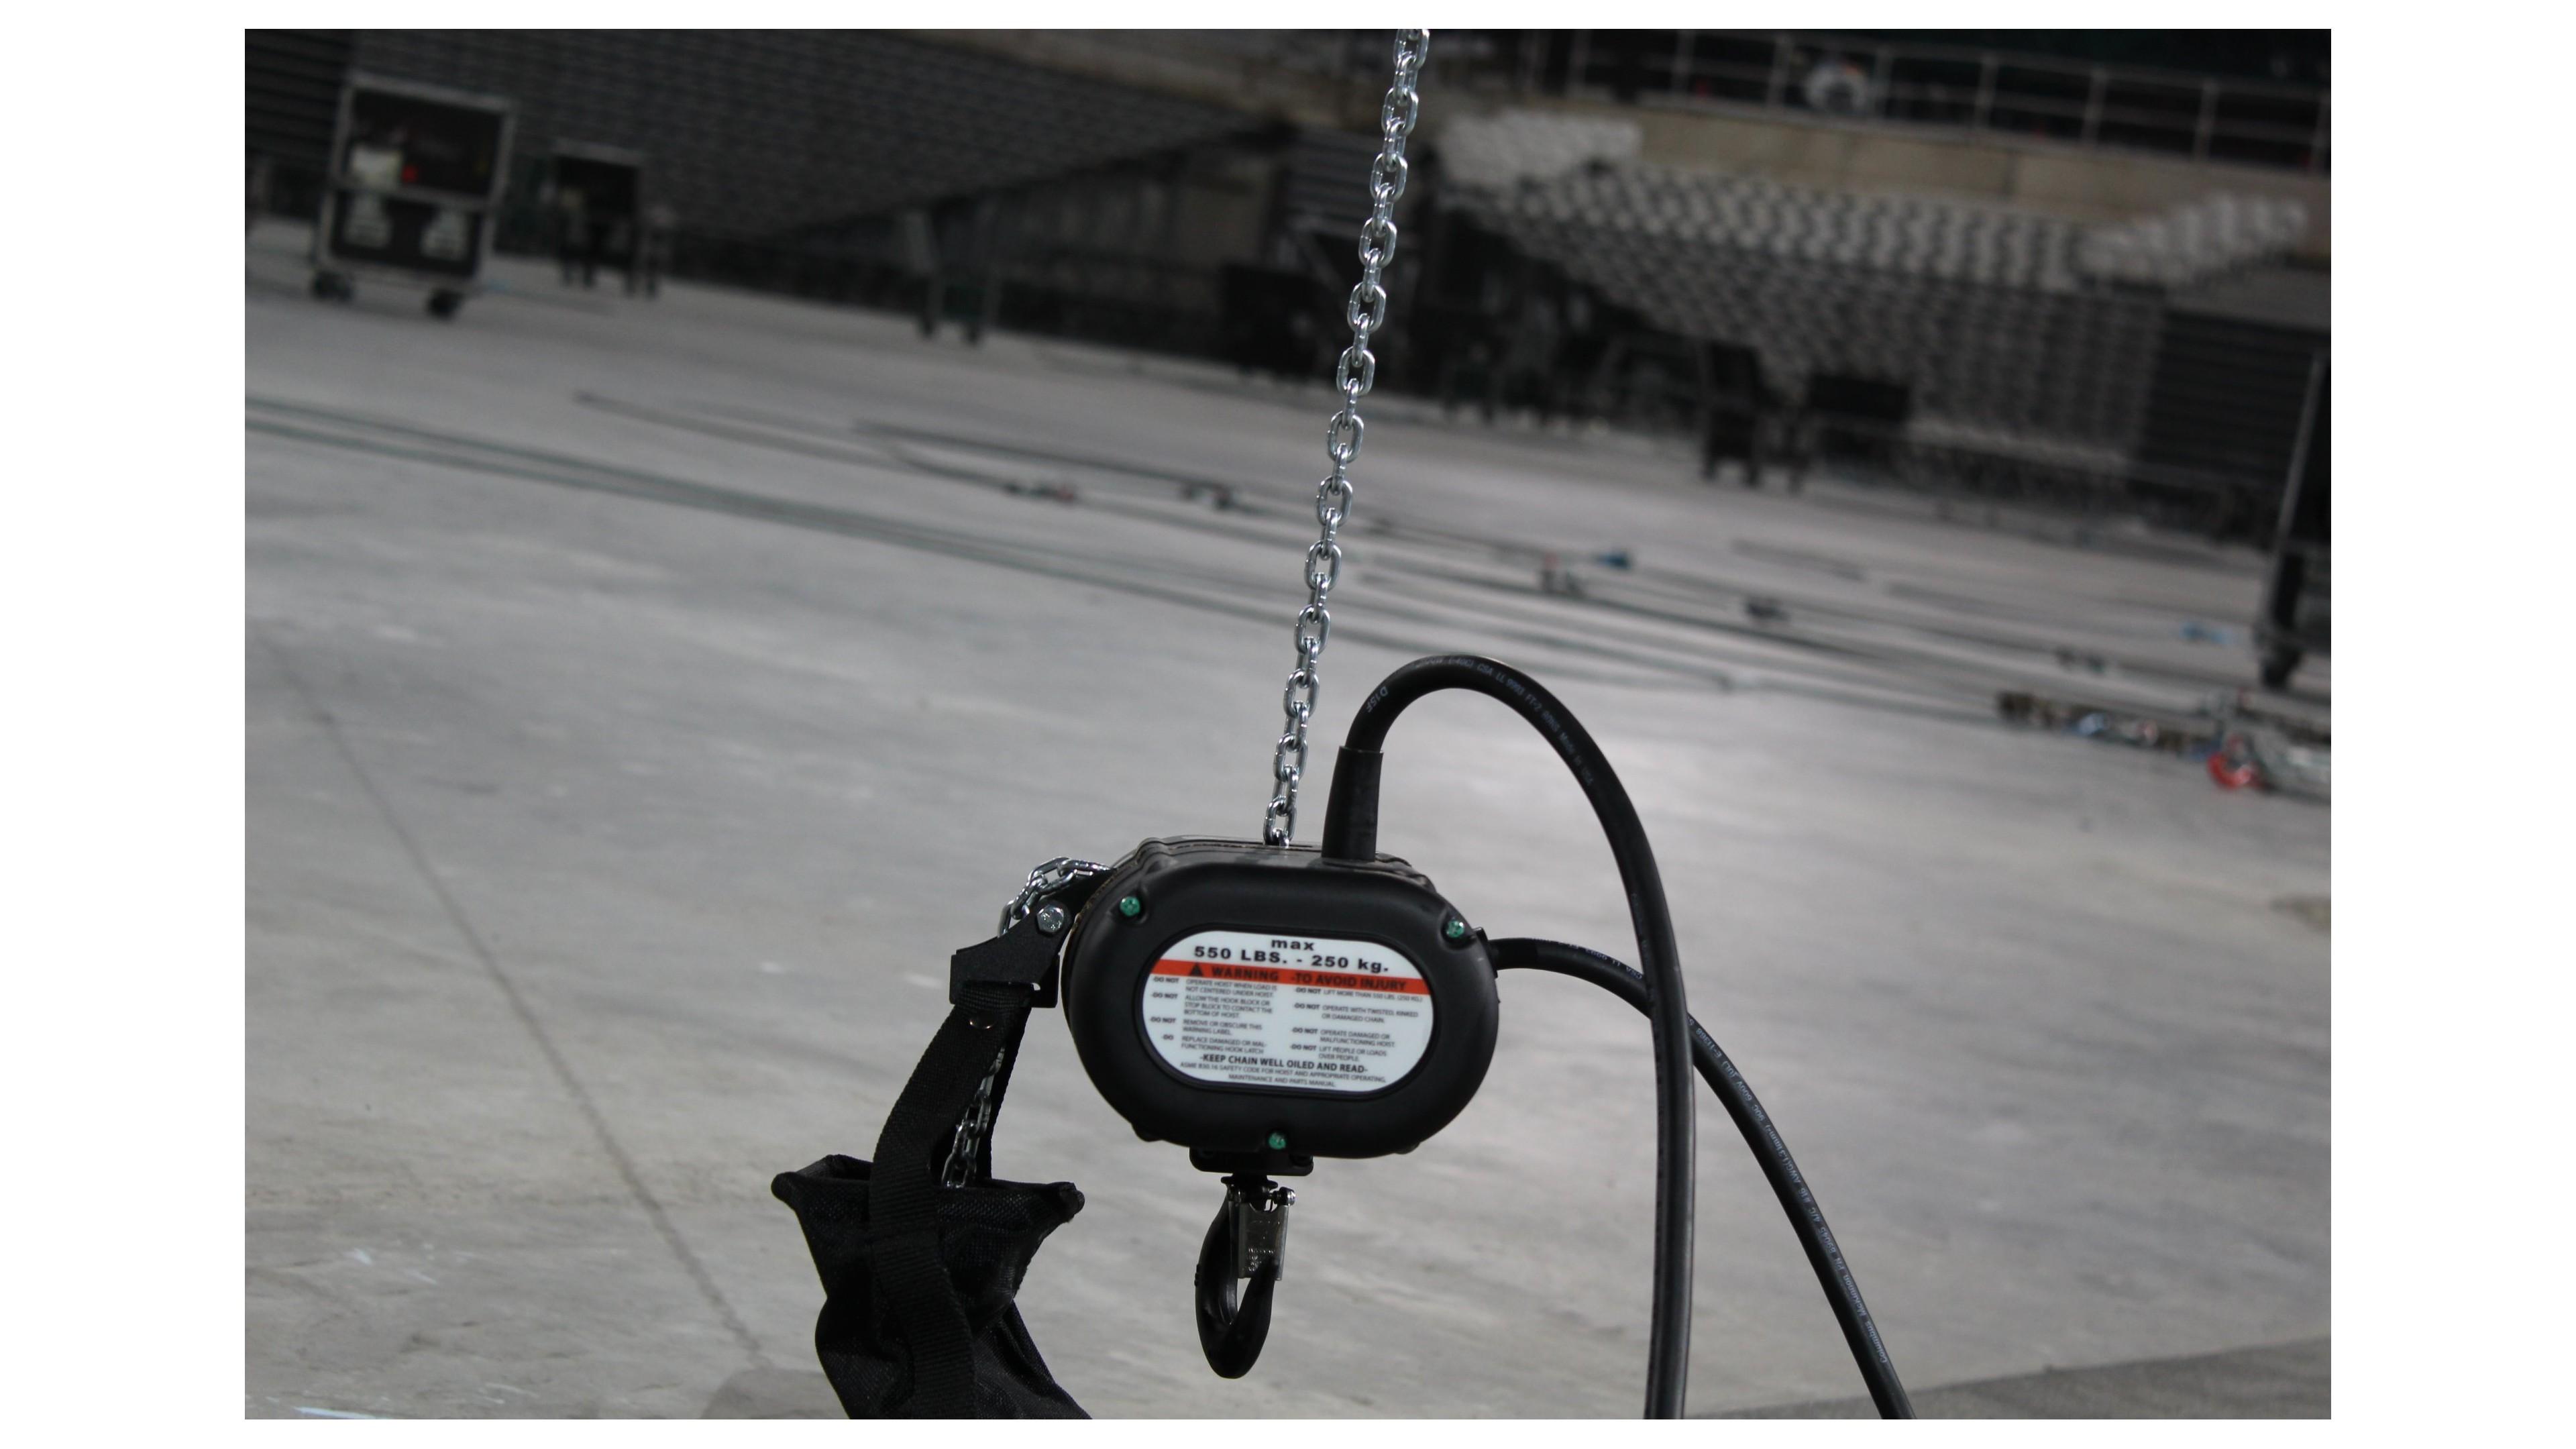 Cm Prostar 250 Kg Electric Chain Hoist Limit Switch Wiring Diagram Gear